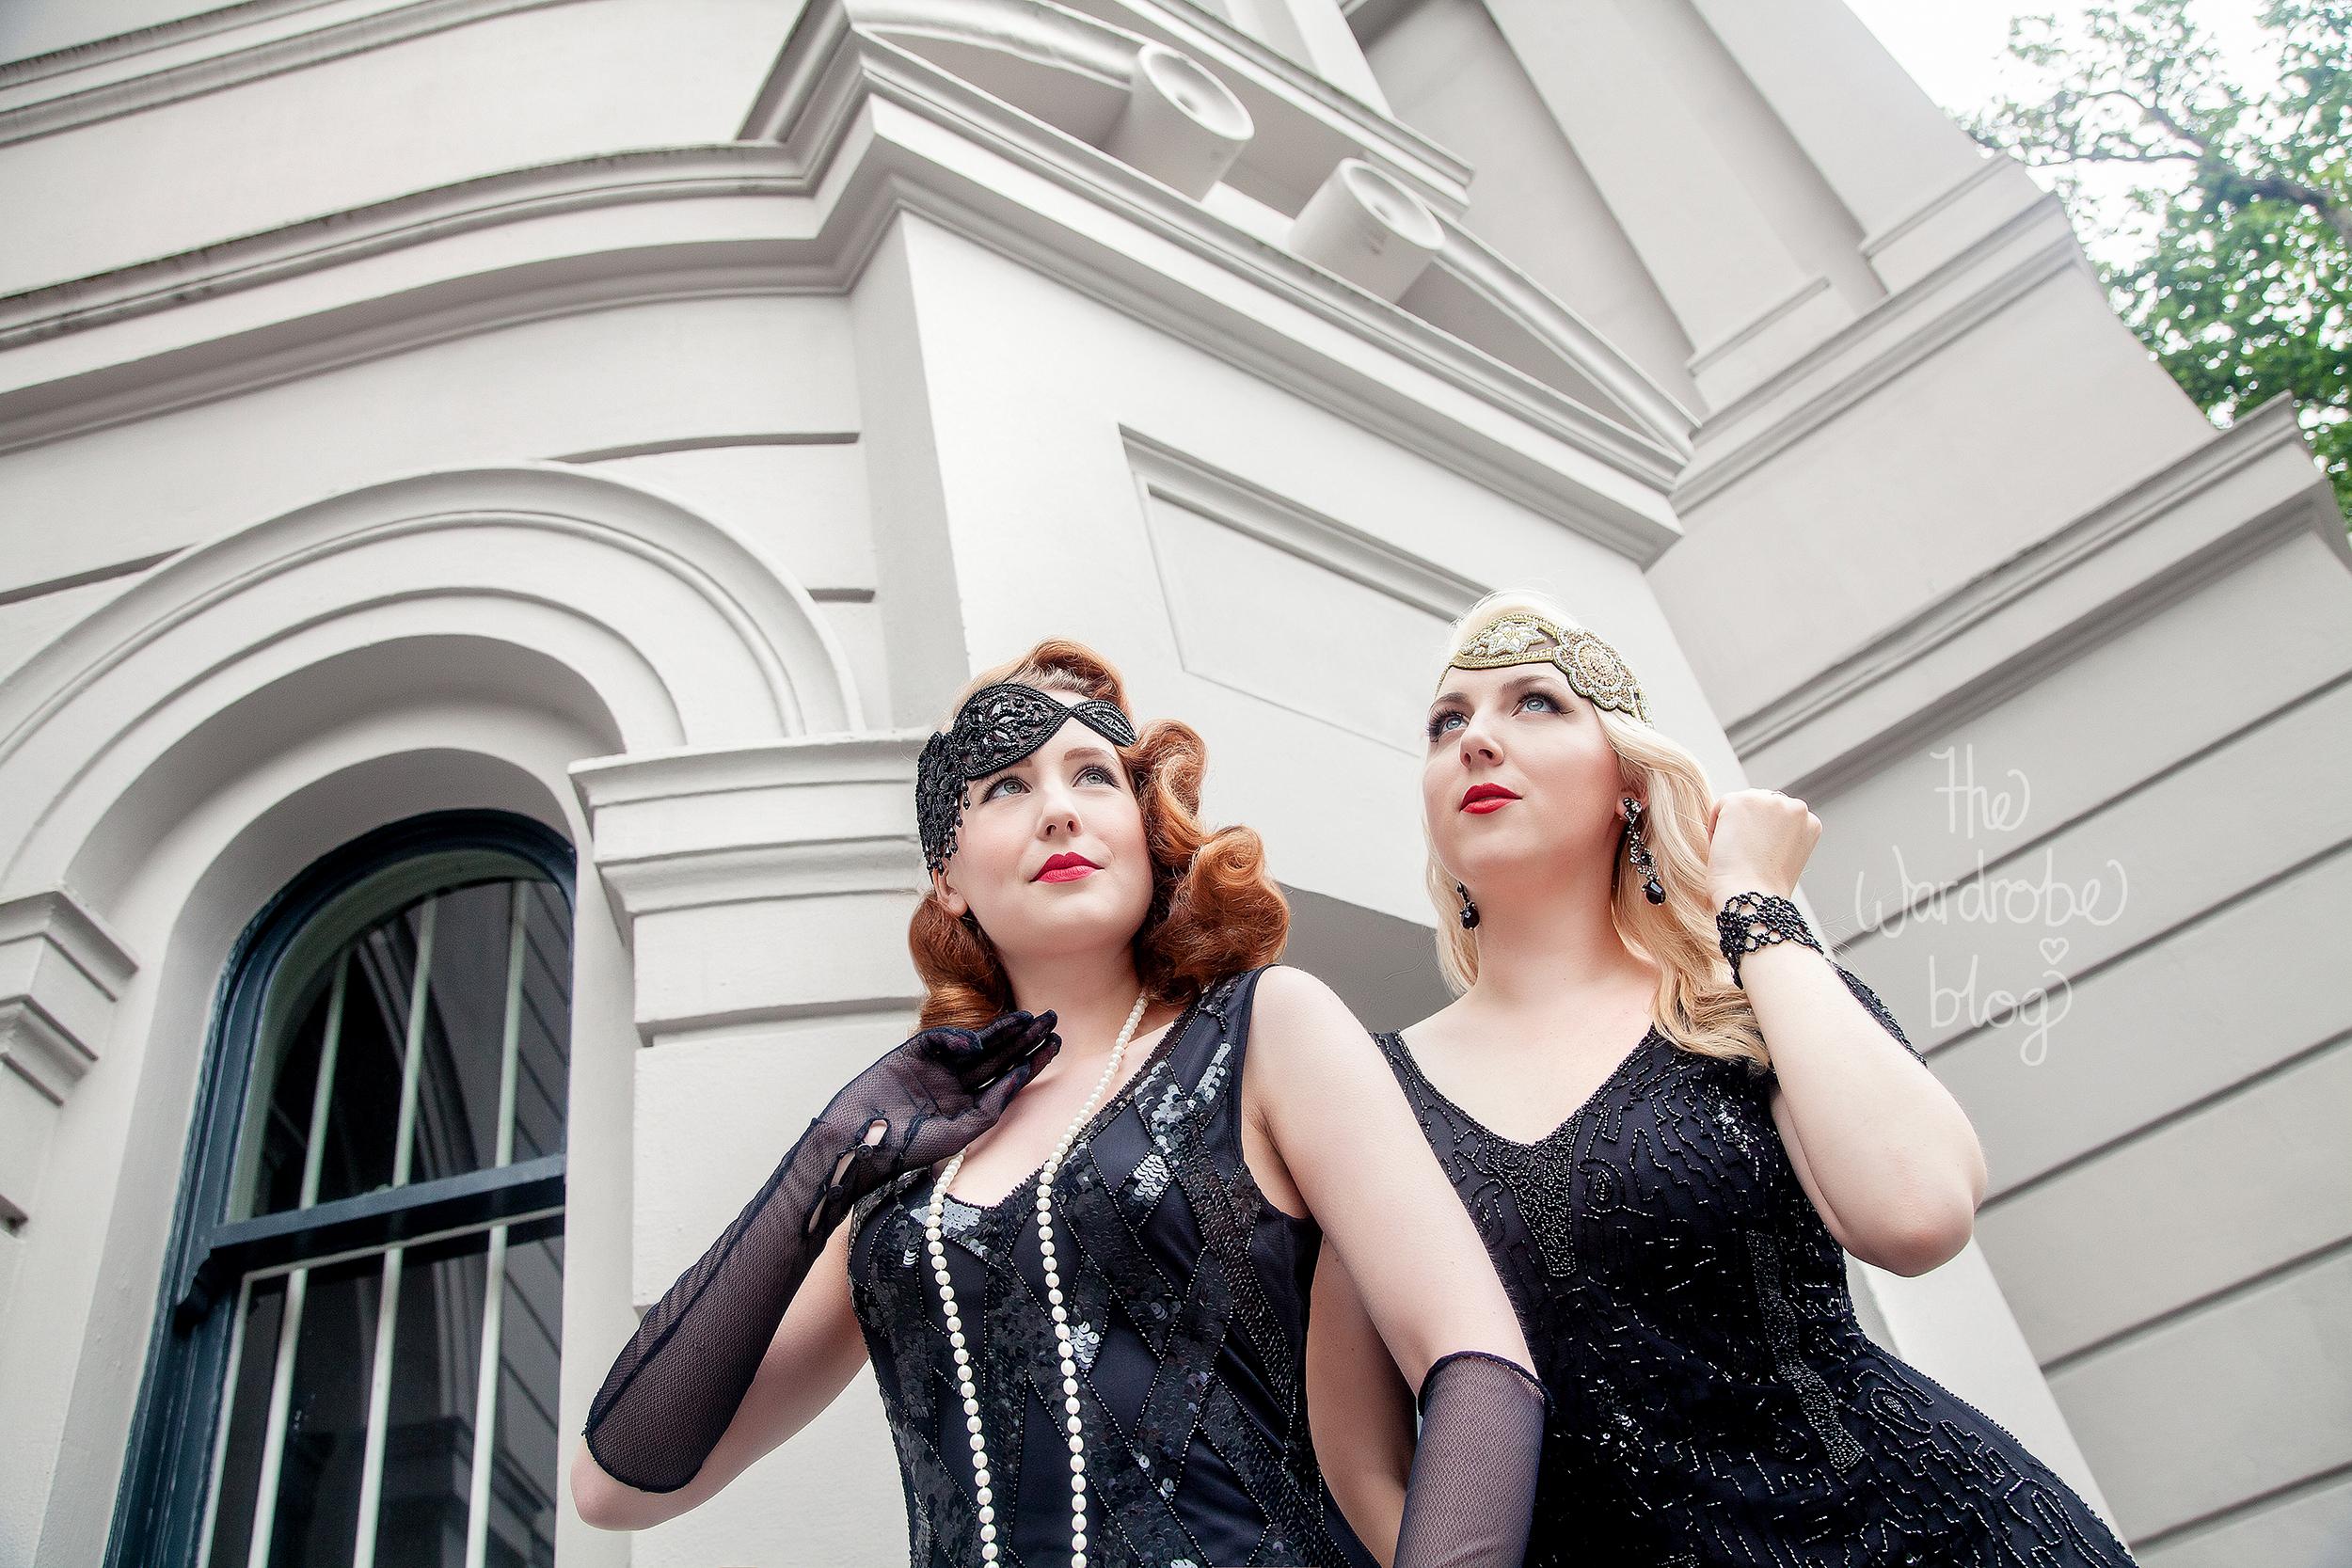 I wear: Downton Abbey Vintage Inspired Flapper Dress in Black, with the Amelia Vintage headband. Earrings + Bracelet from Lovisa. // Miss HH wears:Glitz Vintage Inspired Fringe Dress in Black, and the Julia Vintage headband.